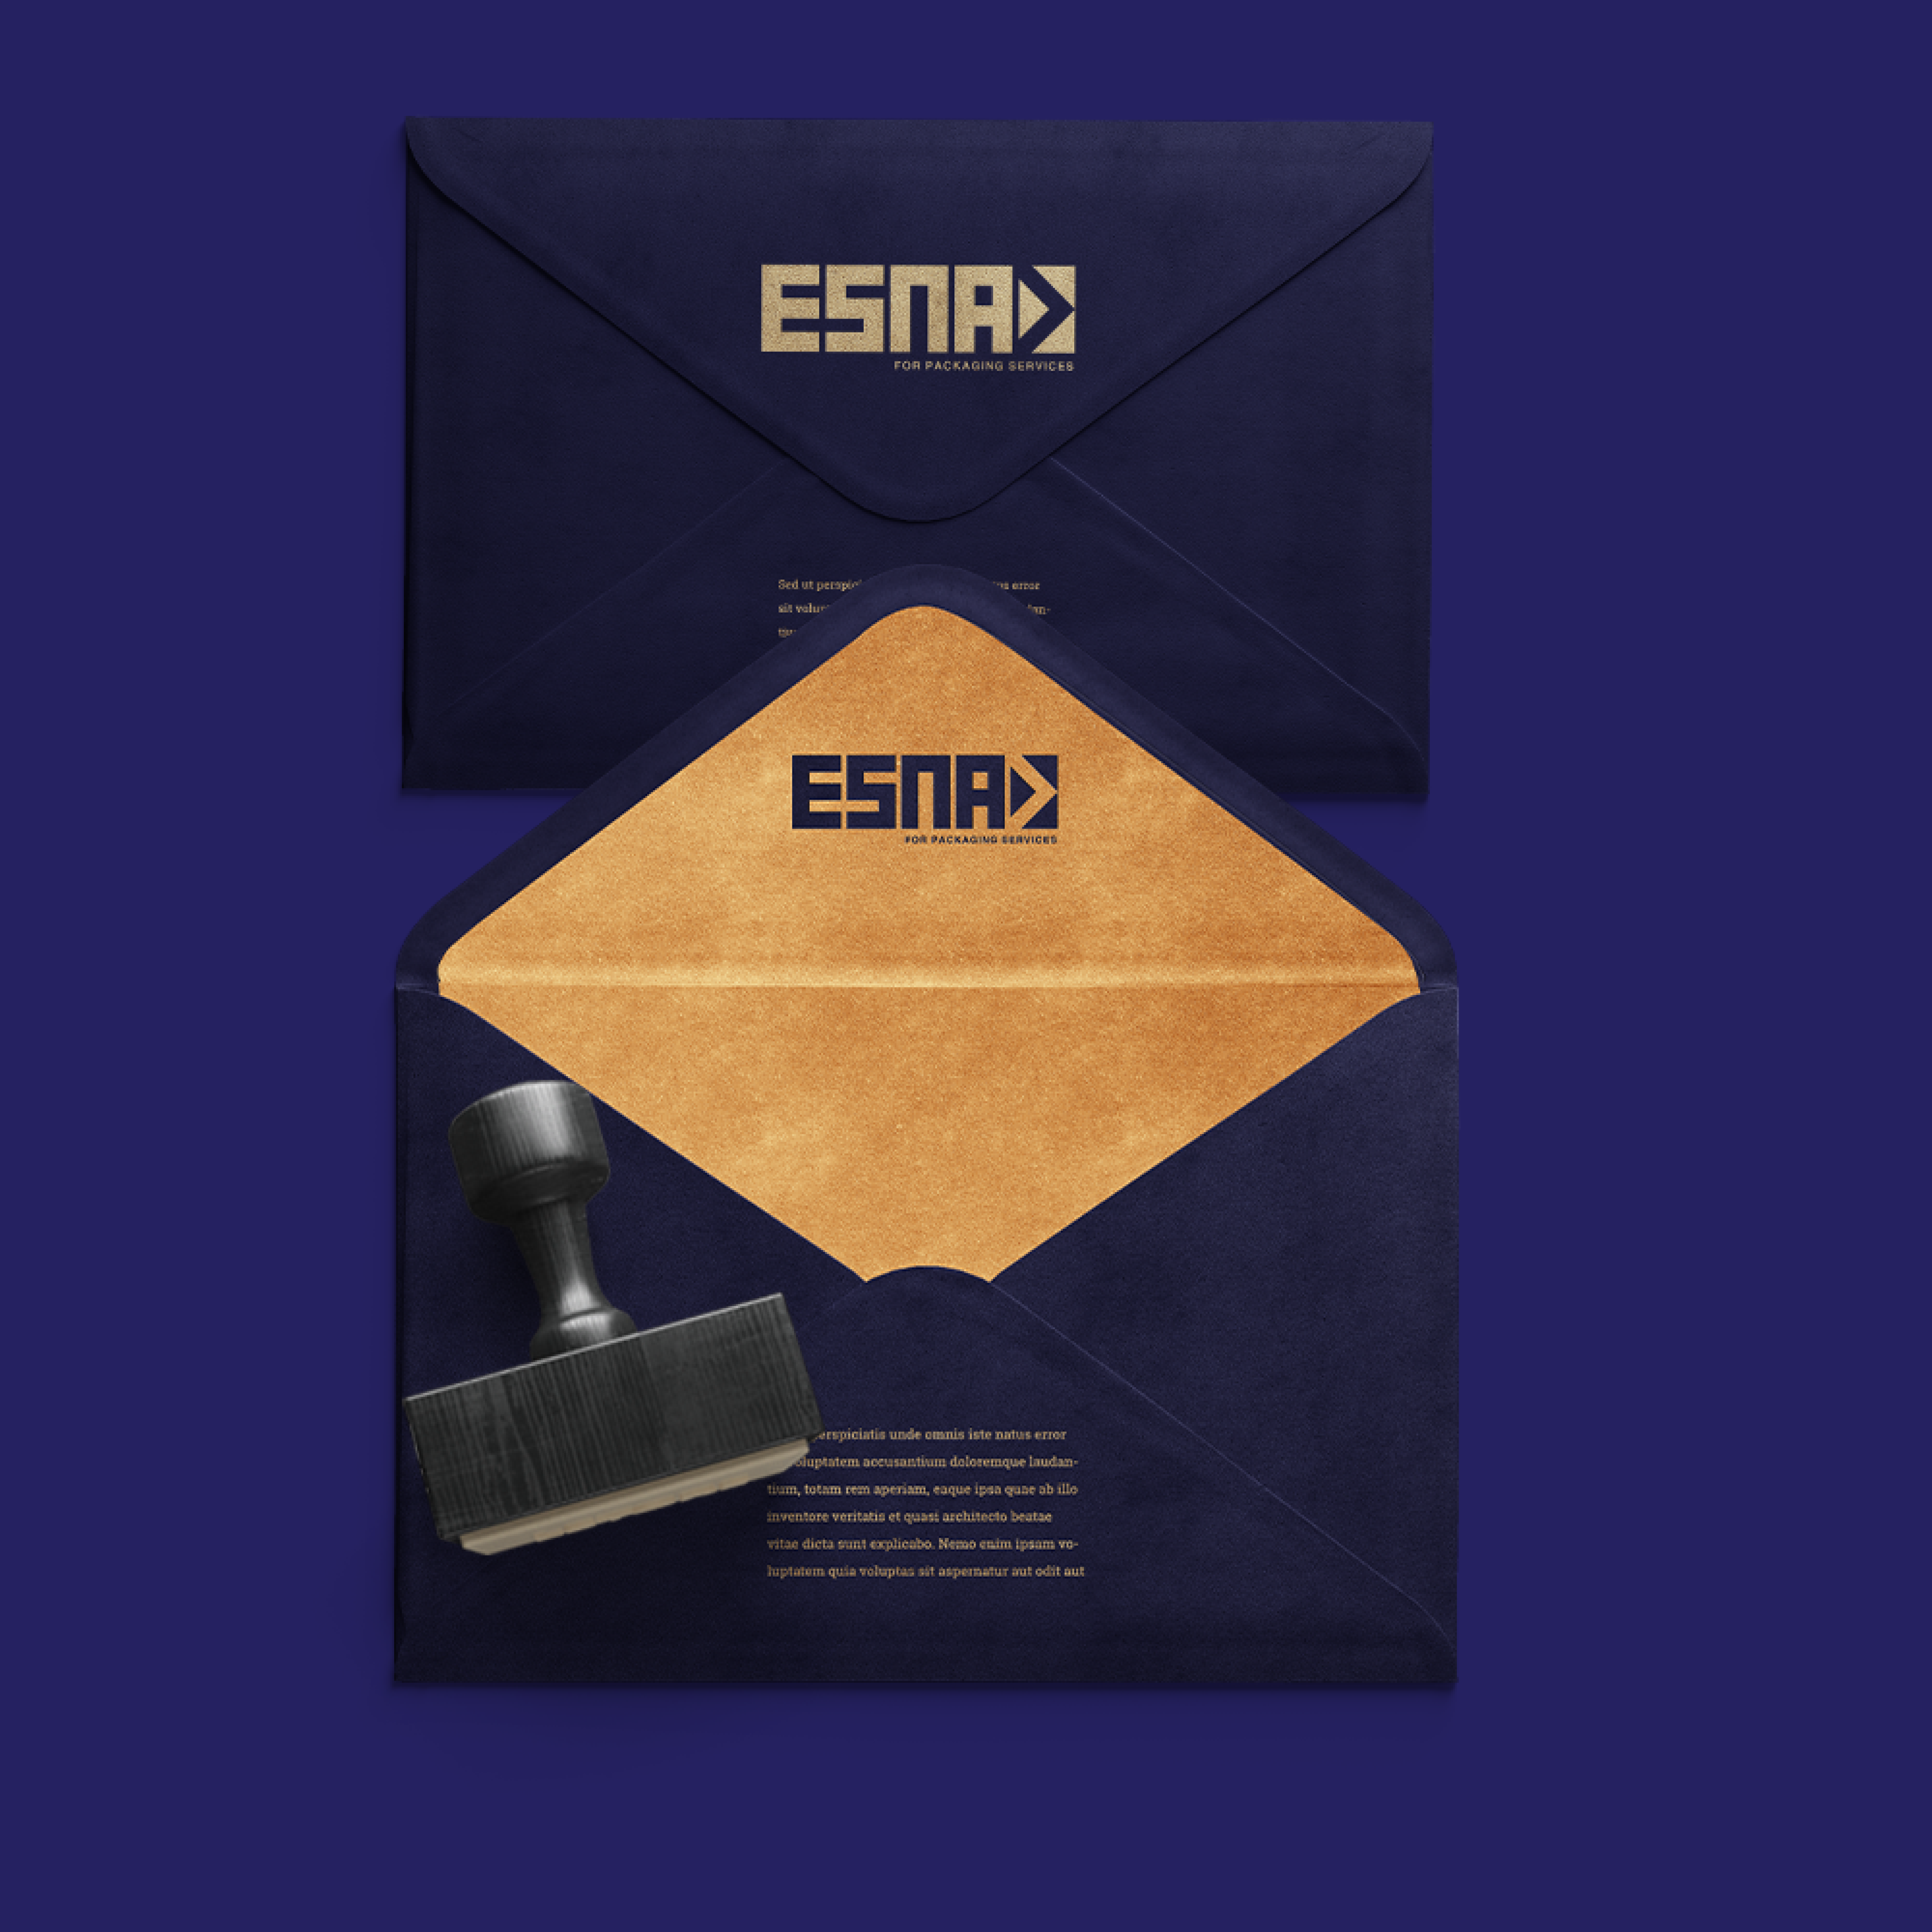 https://theportalagency.com/project/esnad-branding/